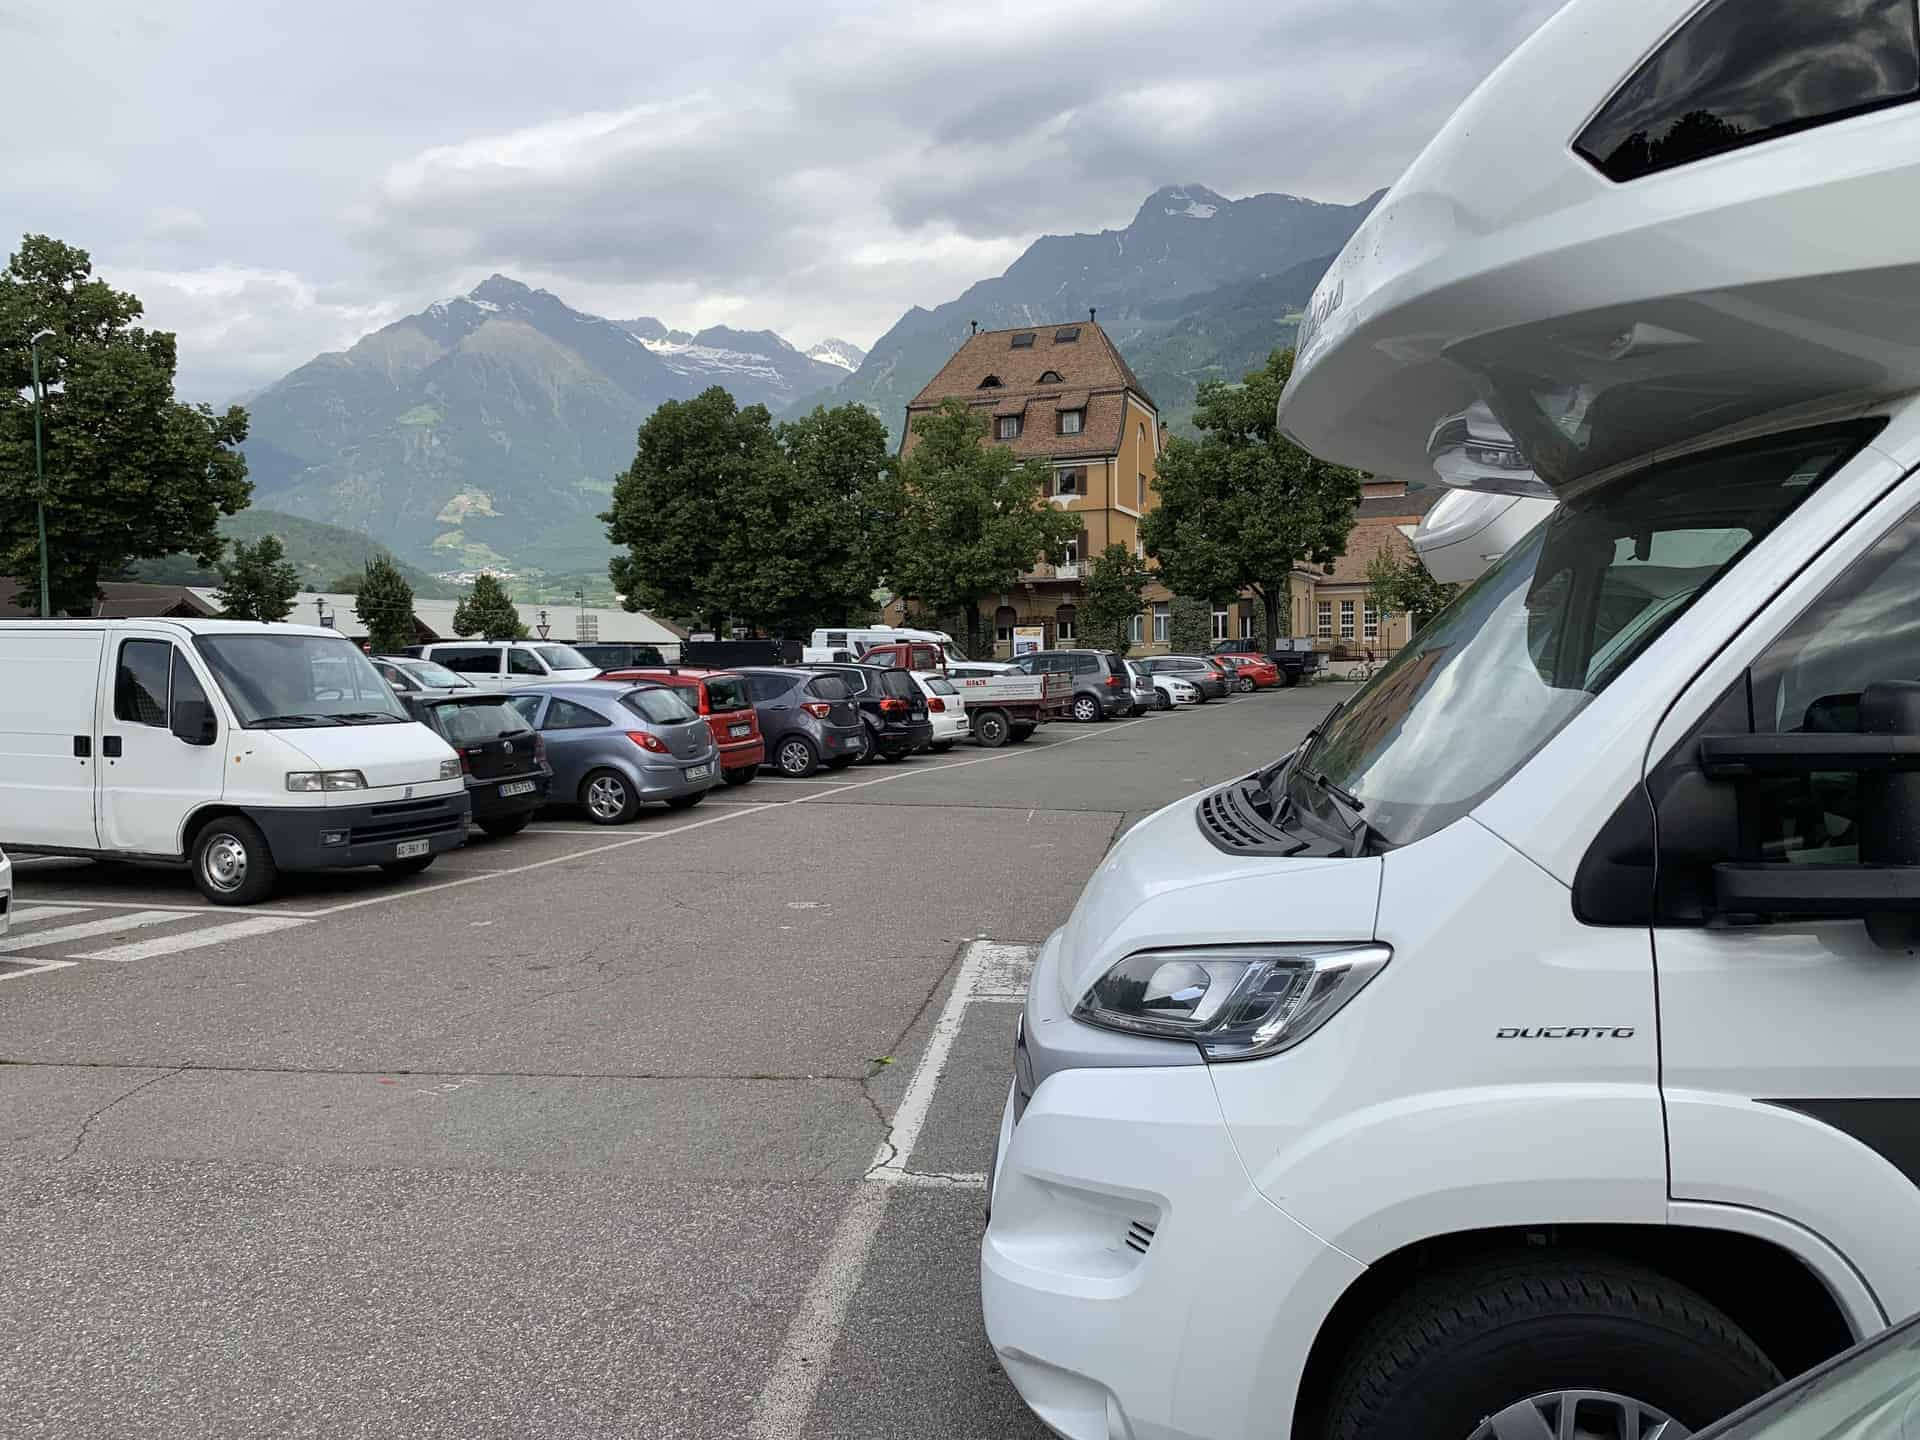 Meran_Parkplatz_Am_Morgen